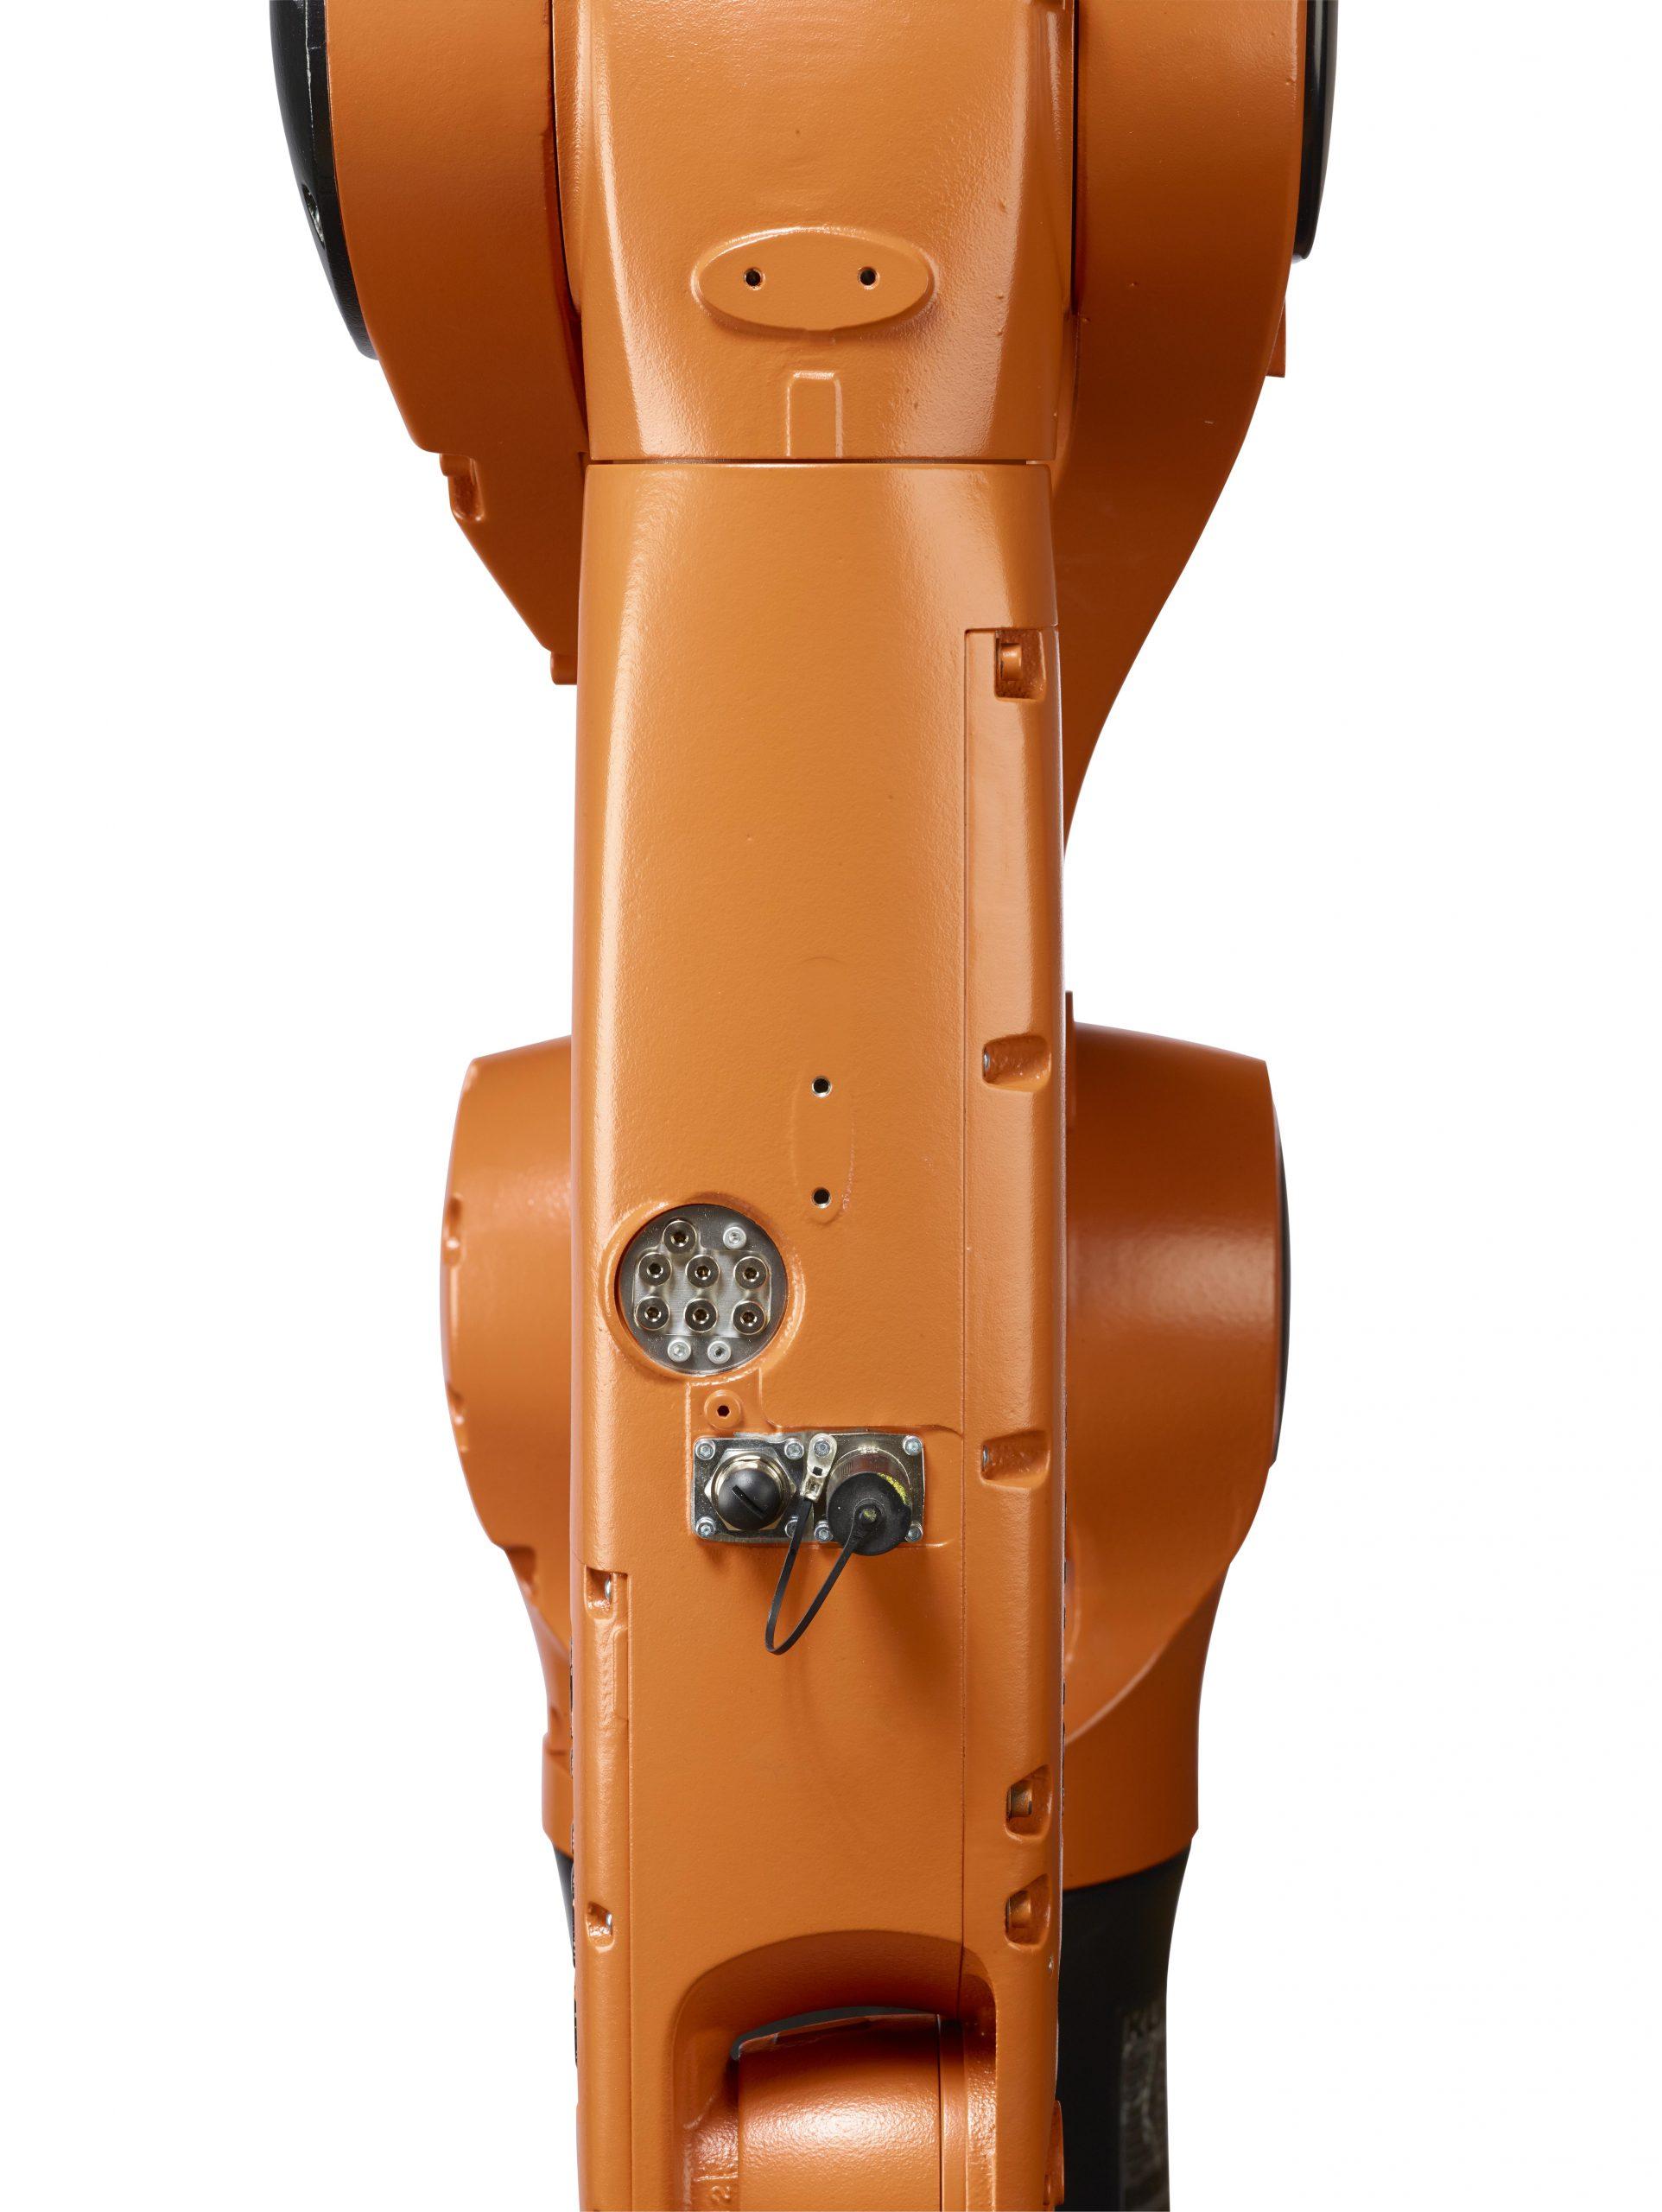 KUKA KR 10 R1100 fivve (KR AGILUS)-8